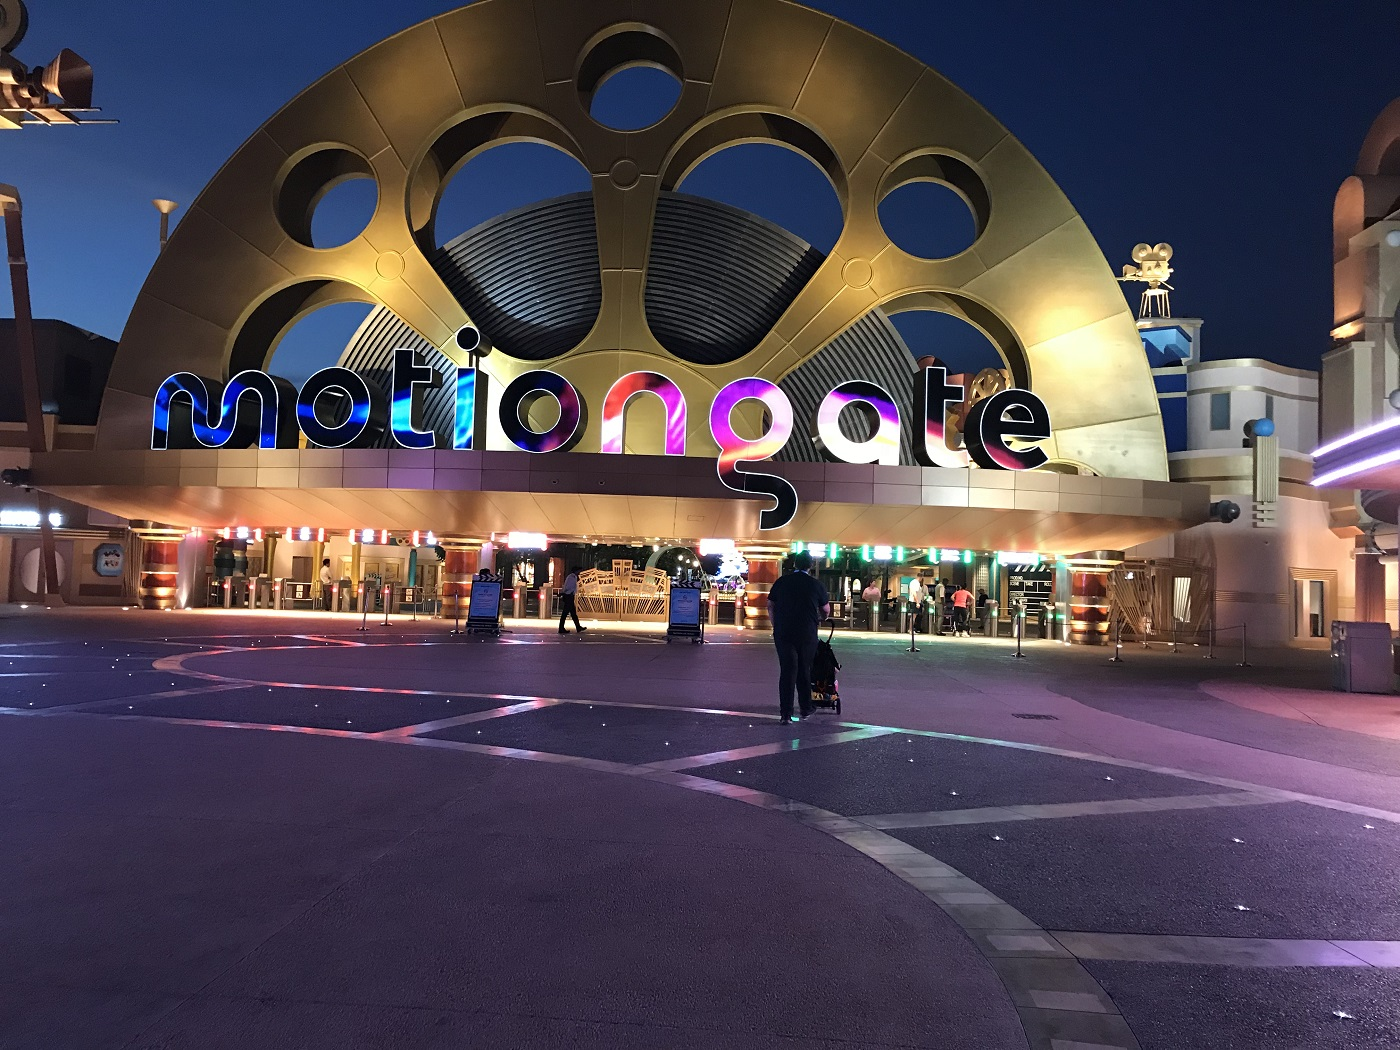 UAE National Day 2020 offer at Dubai Parks – Motiongate | LEGOland | Bollywood park